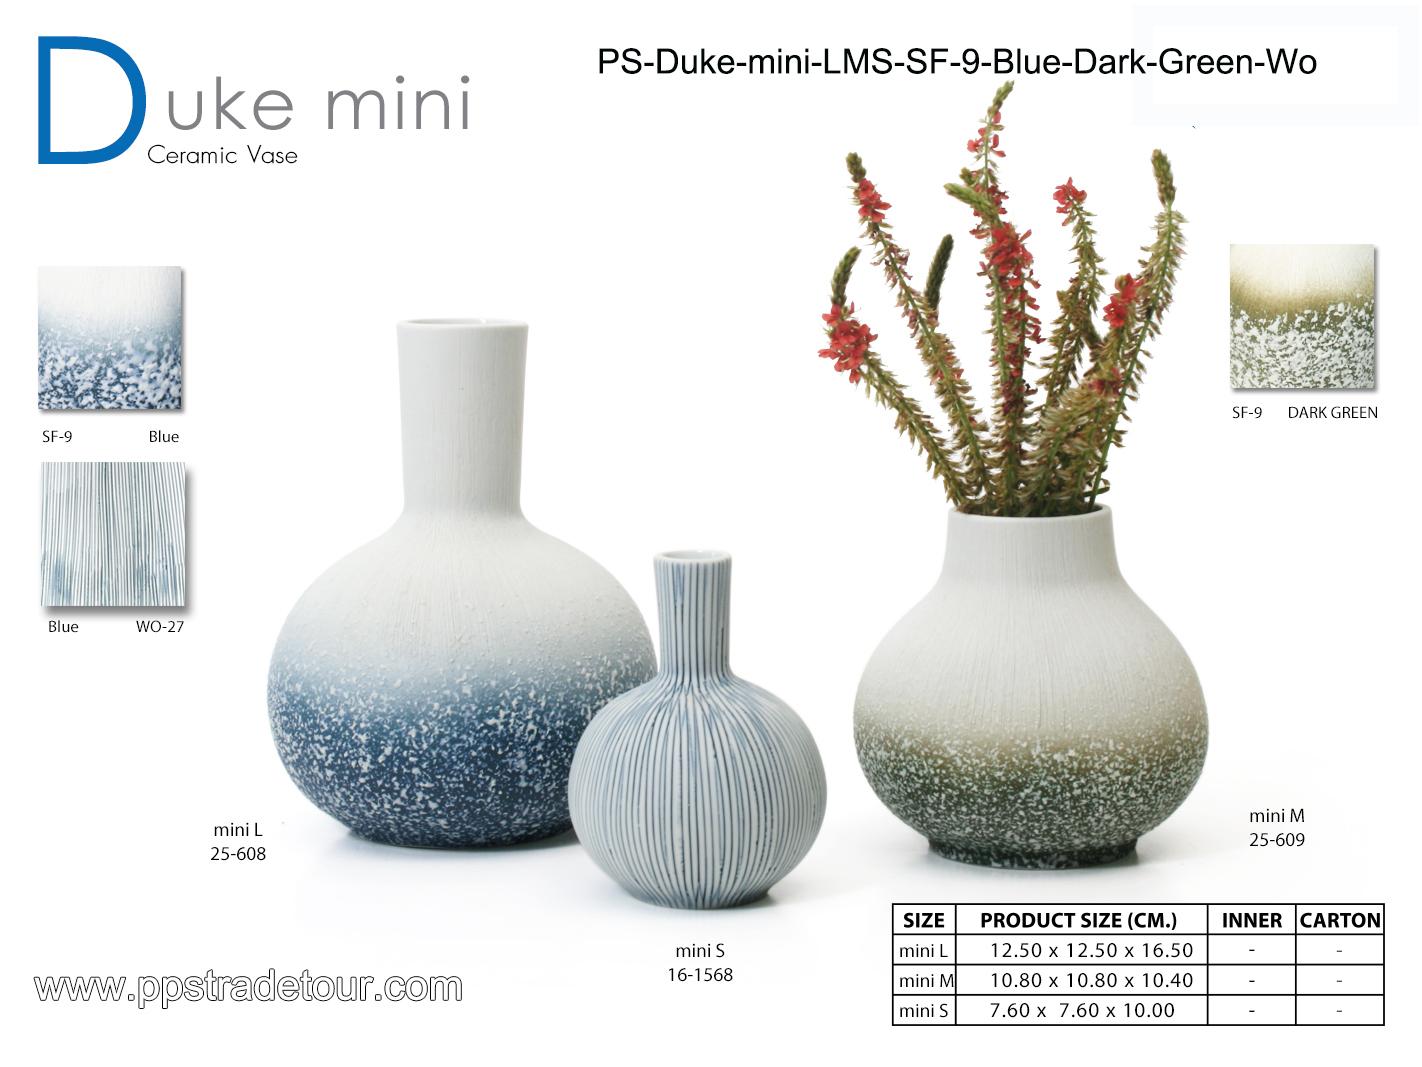 PSCV-Duke-mini-LMS-SF-9-BLUE-DARK-GREEN-WO-27